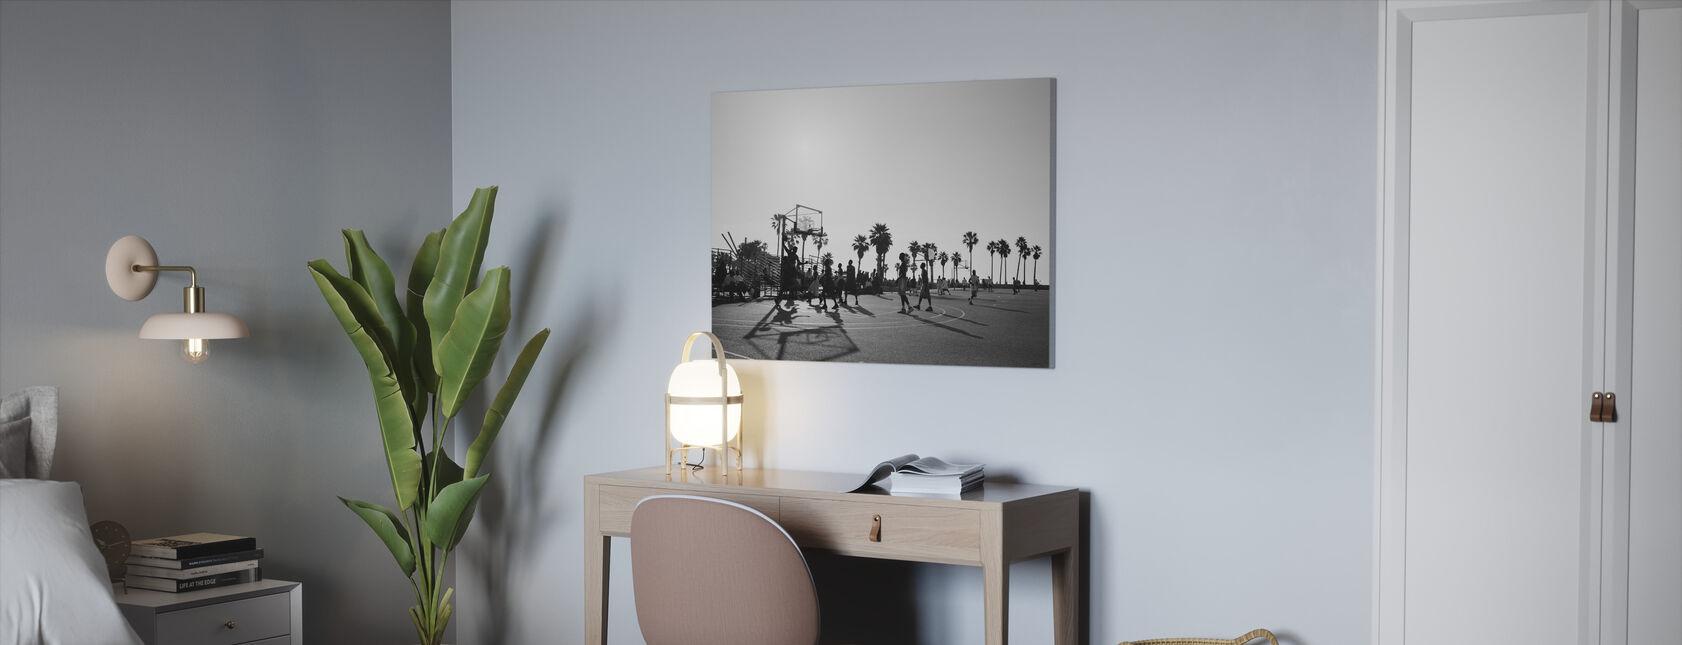 Basketbal in de straten van Los Angeles, Californië - Canvas print - Kantoor